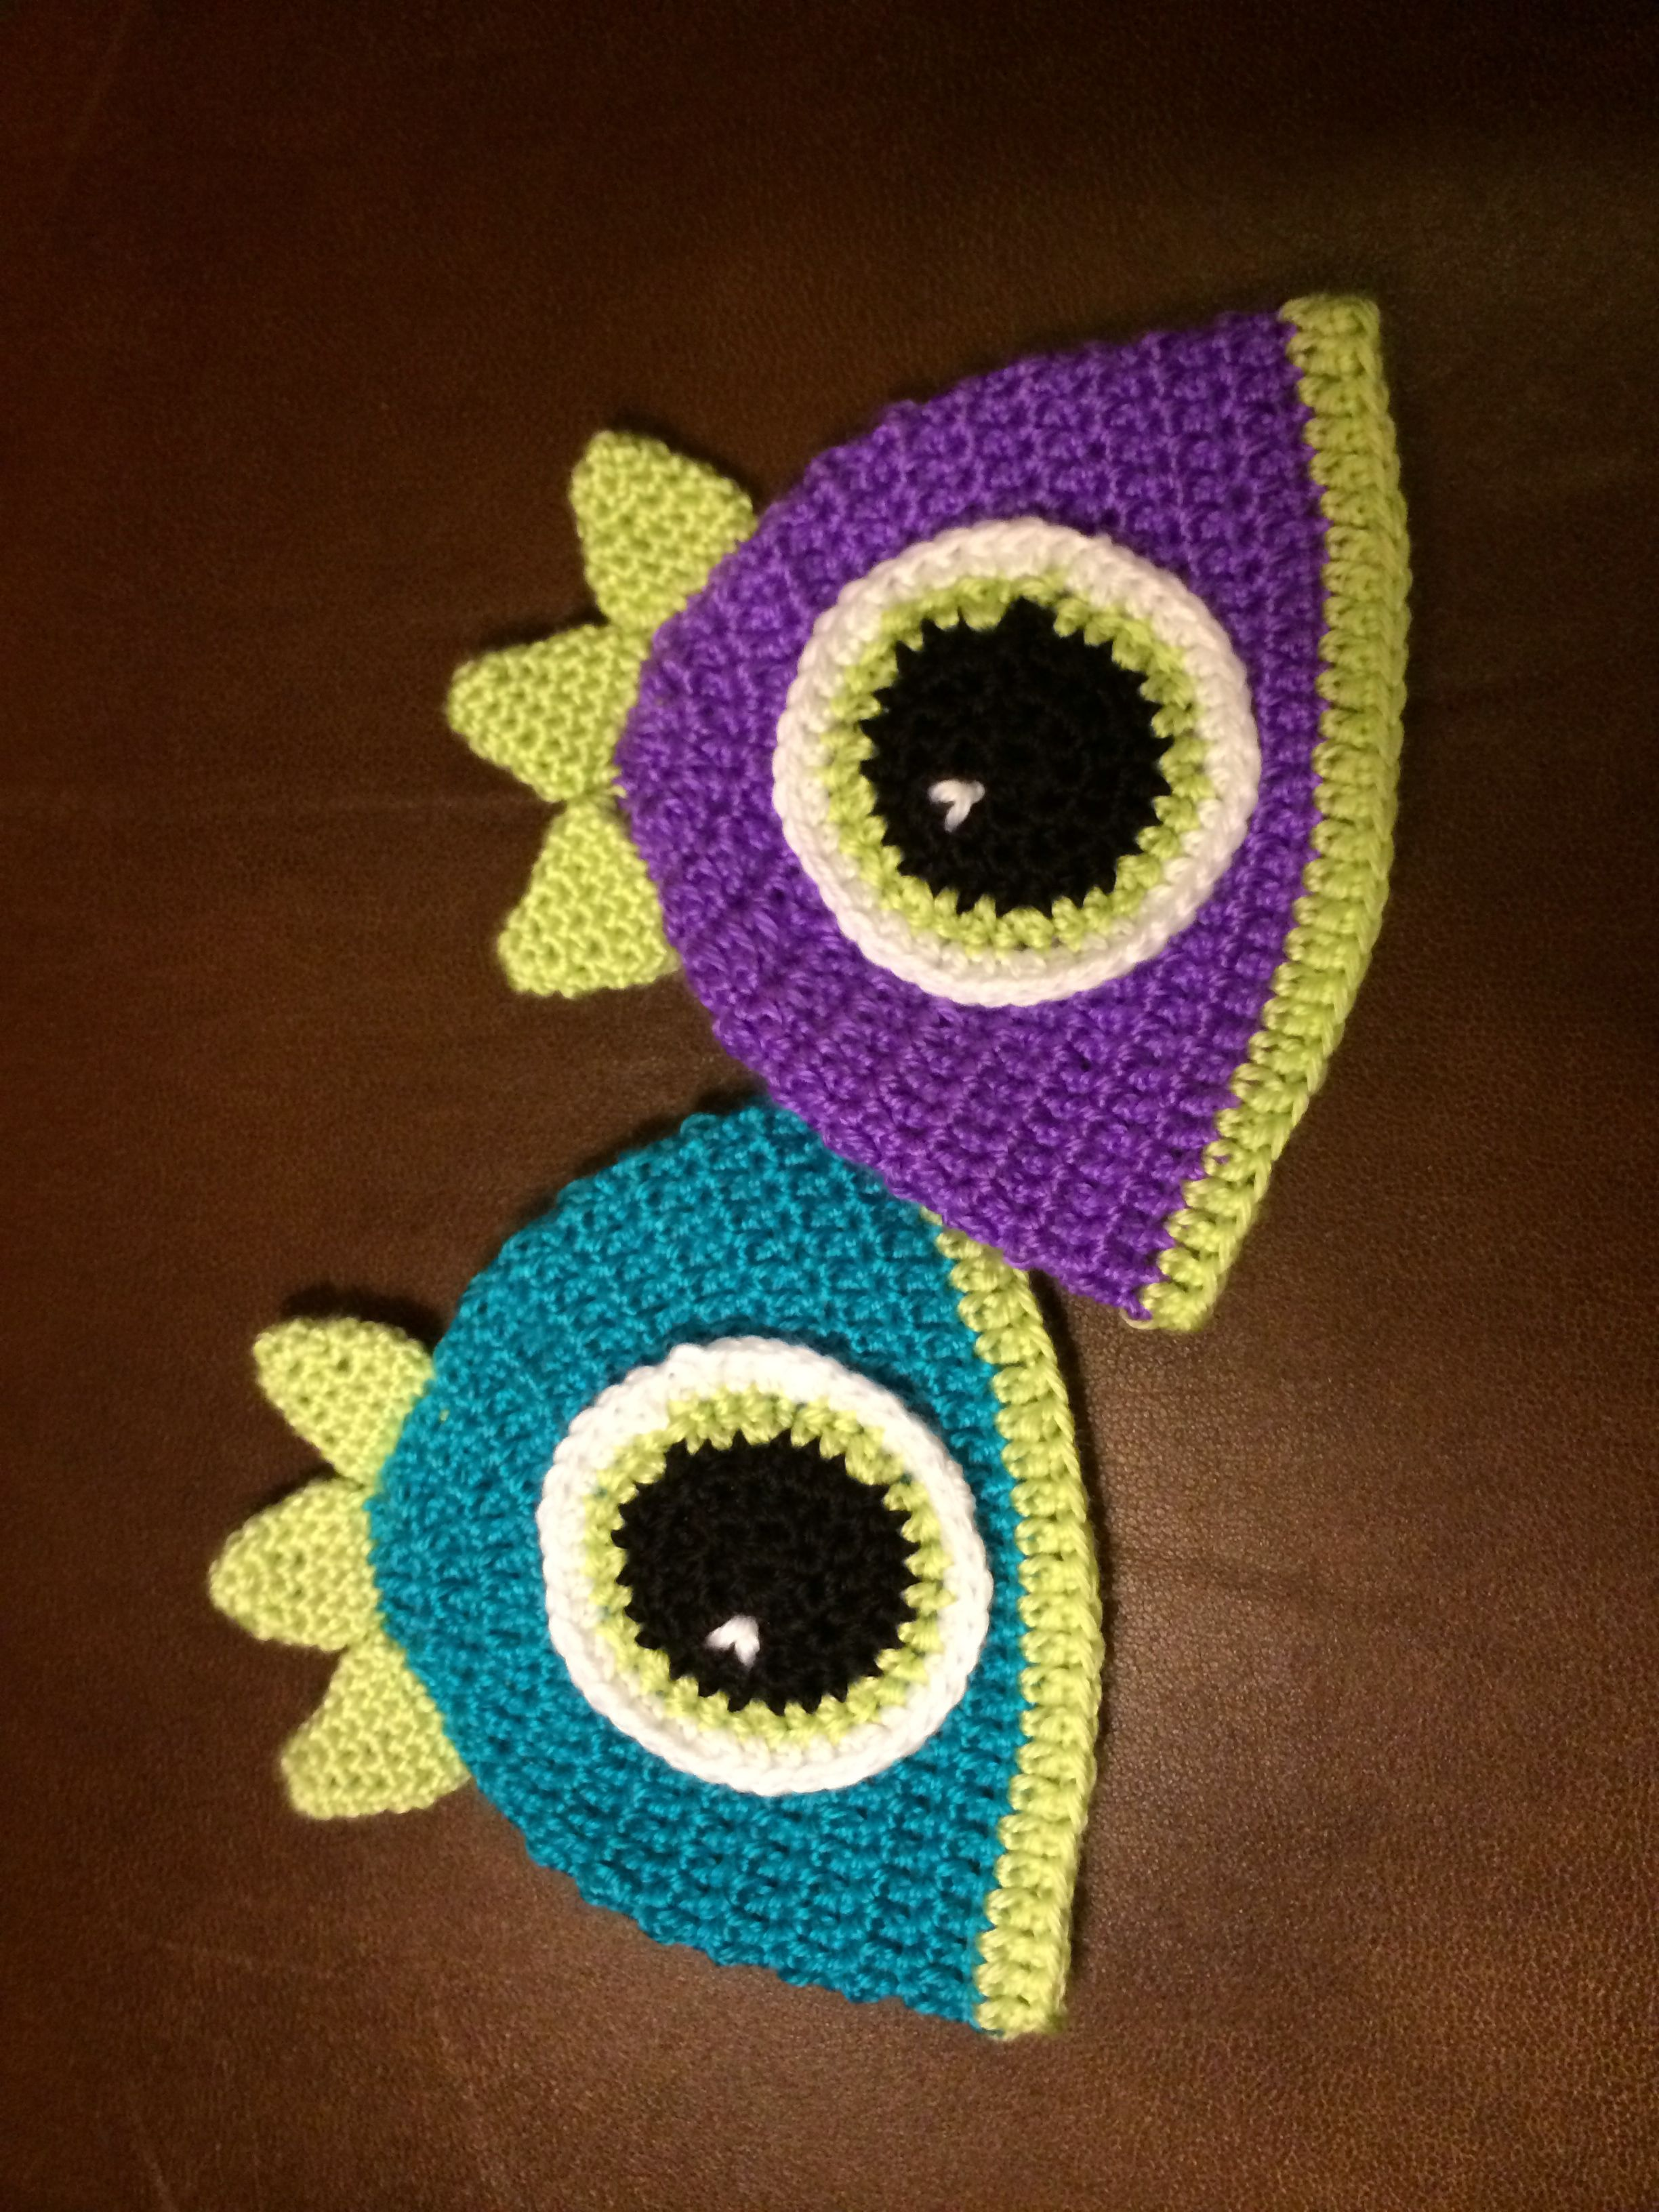 Crochet Monster Hats Crochet 4 Crochet Crochet Hats Crochet